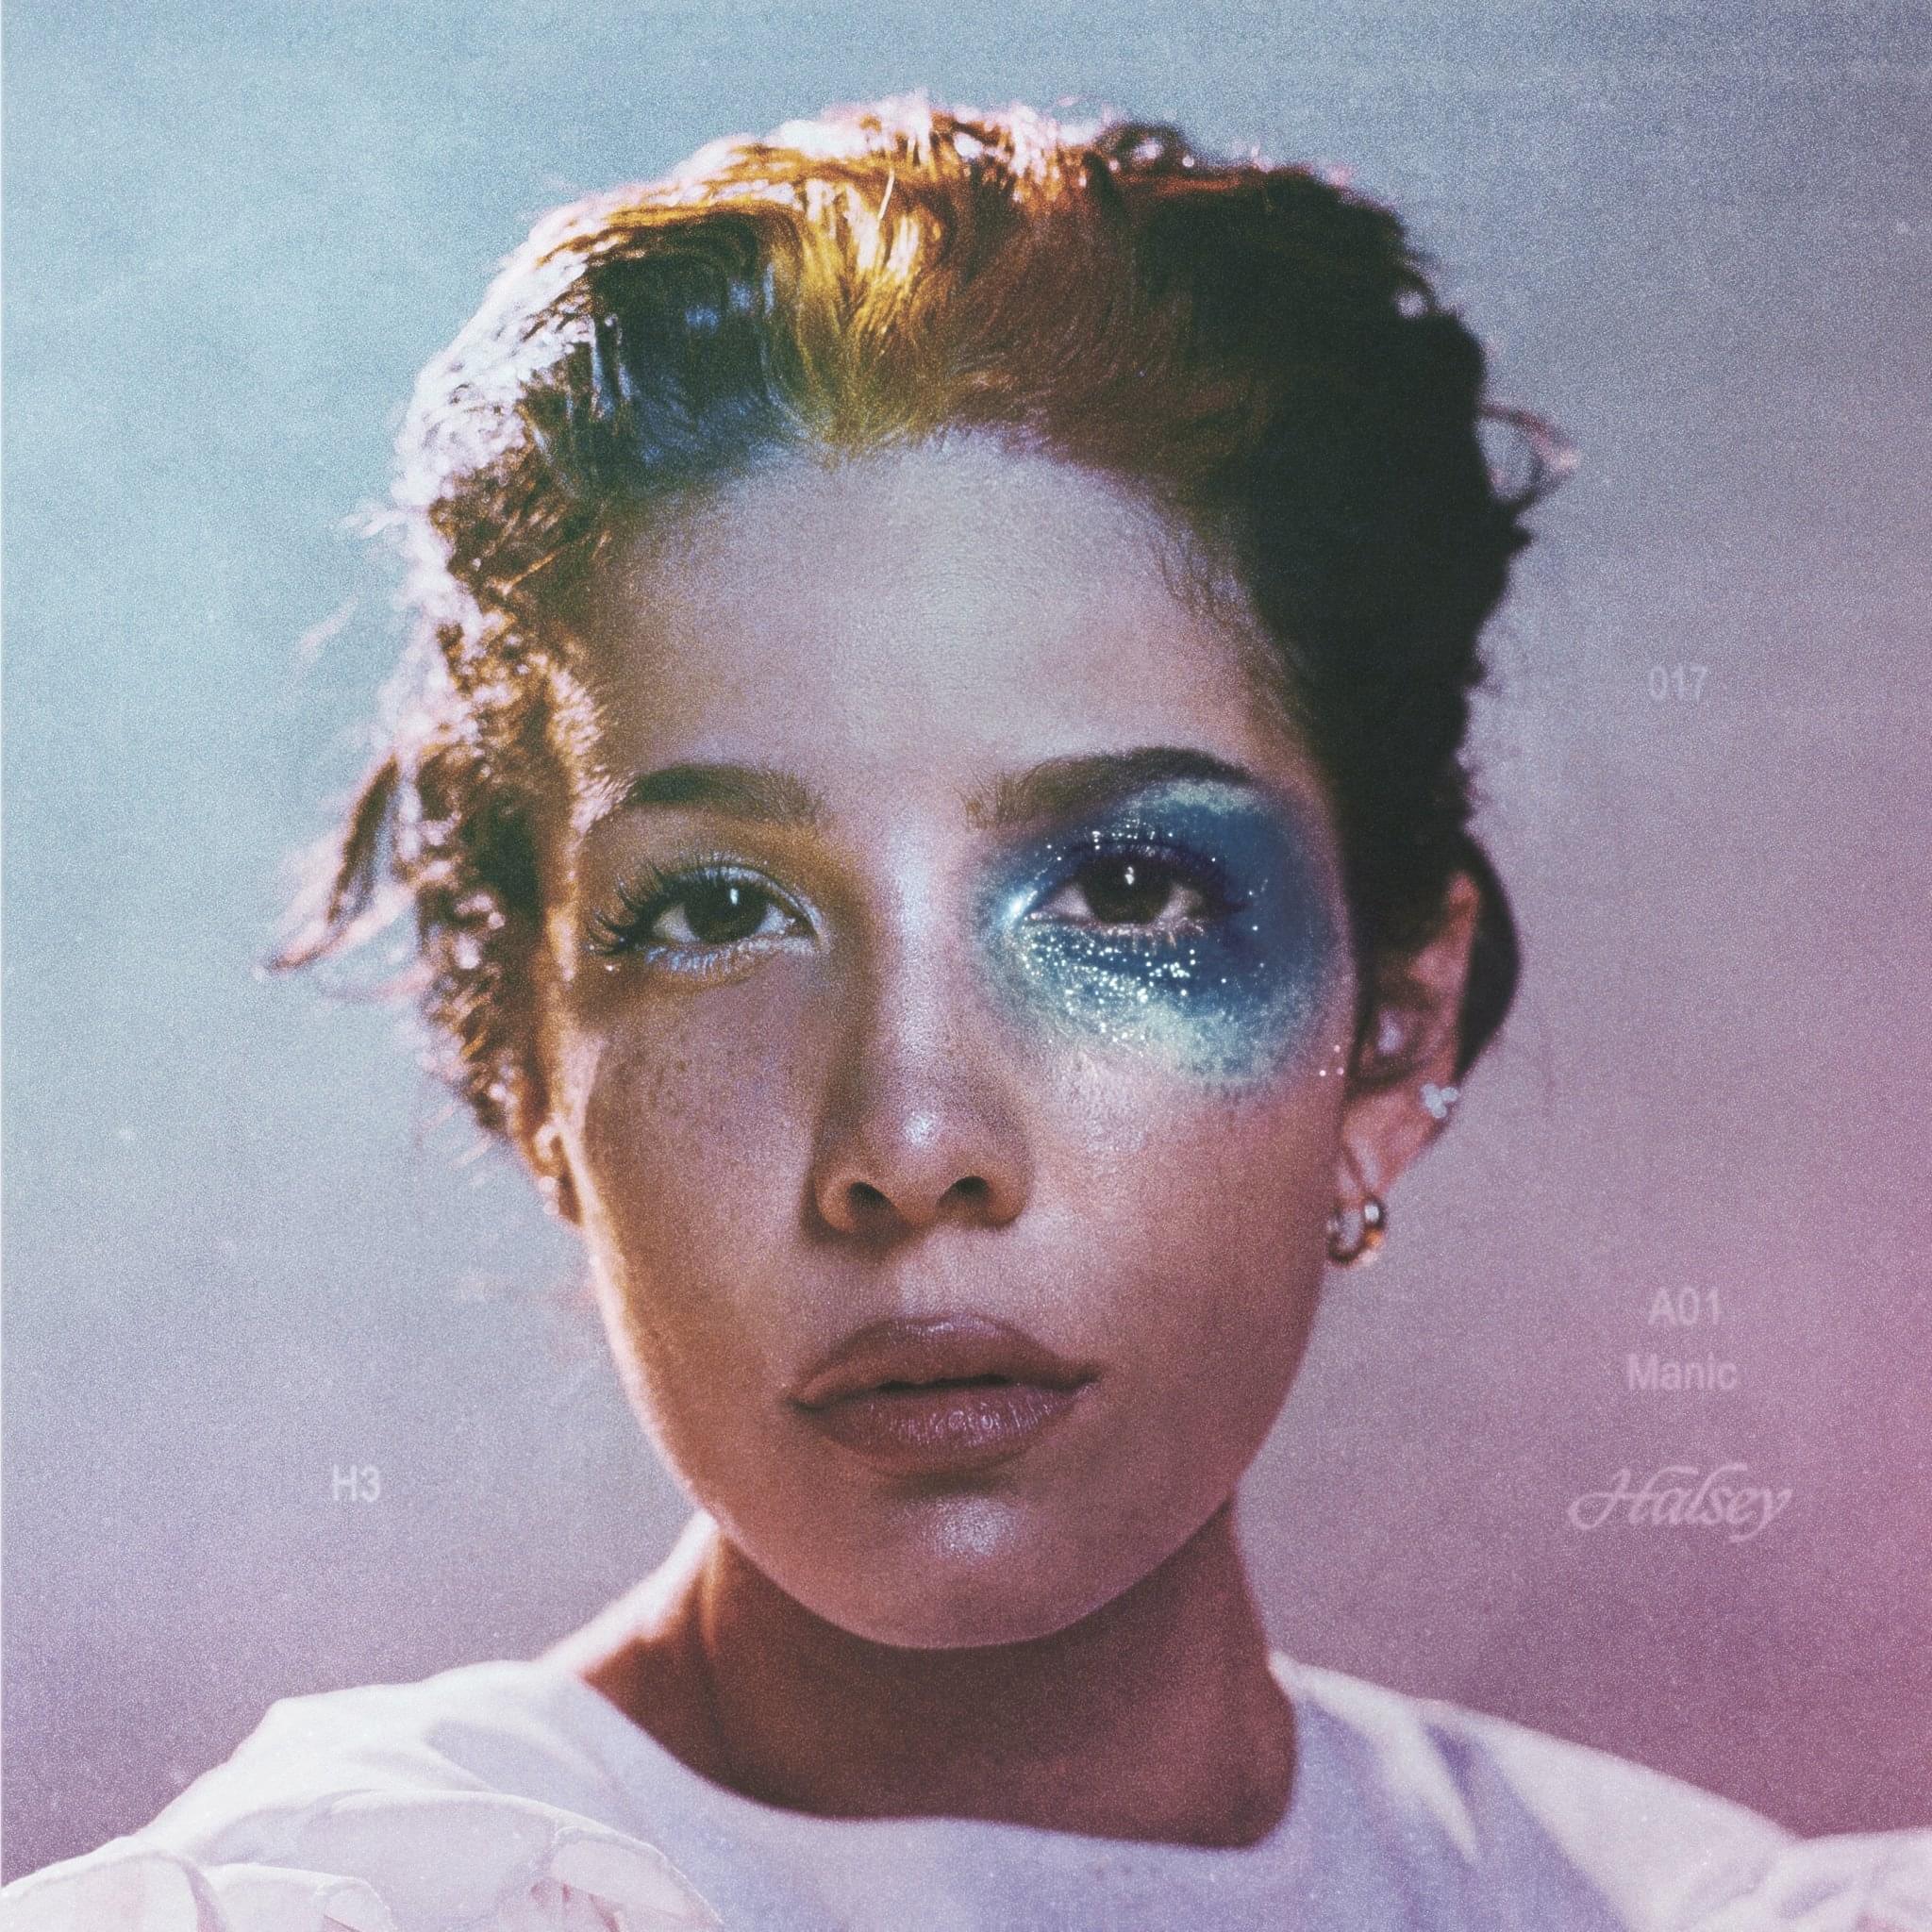 Halsey - You Should Be Sad